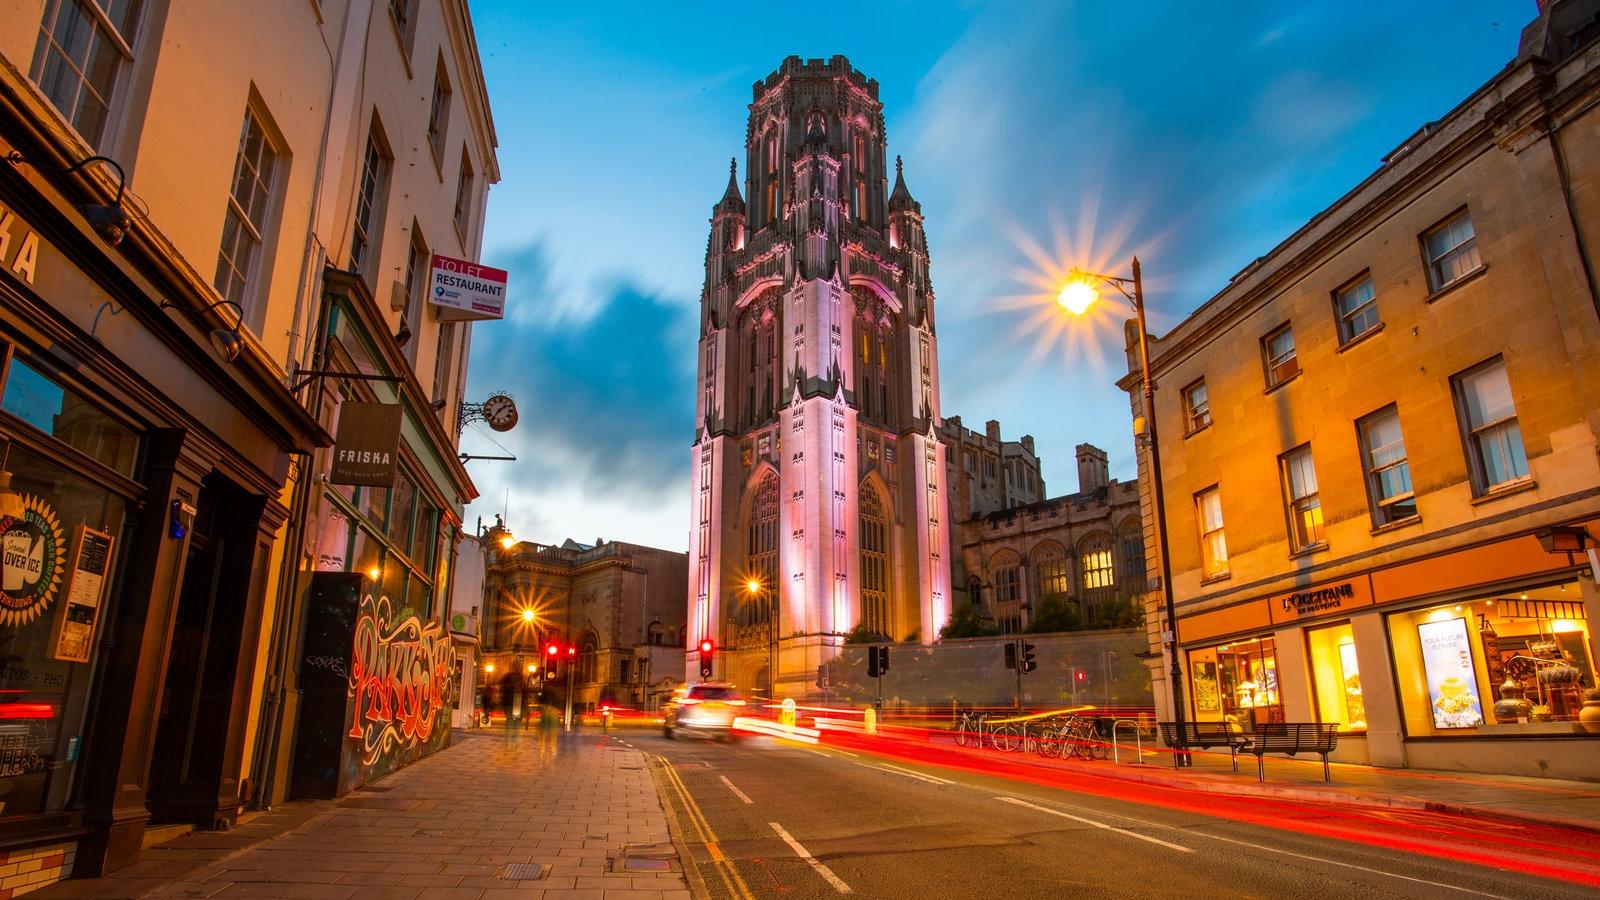 University of Bristol caracterizando arquitetura de patrimônio, cenas noturnas e cenas de rua